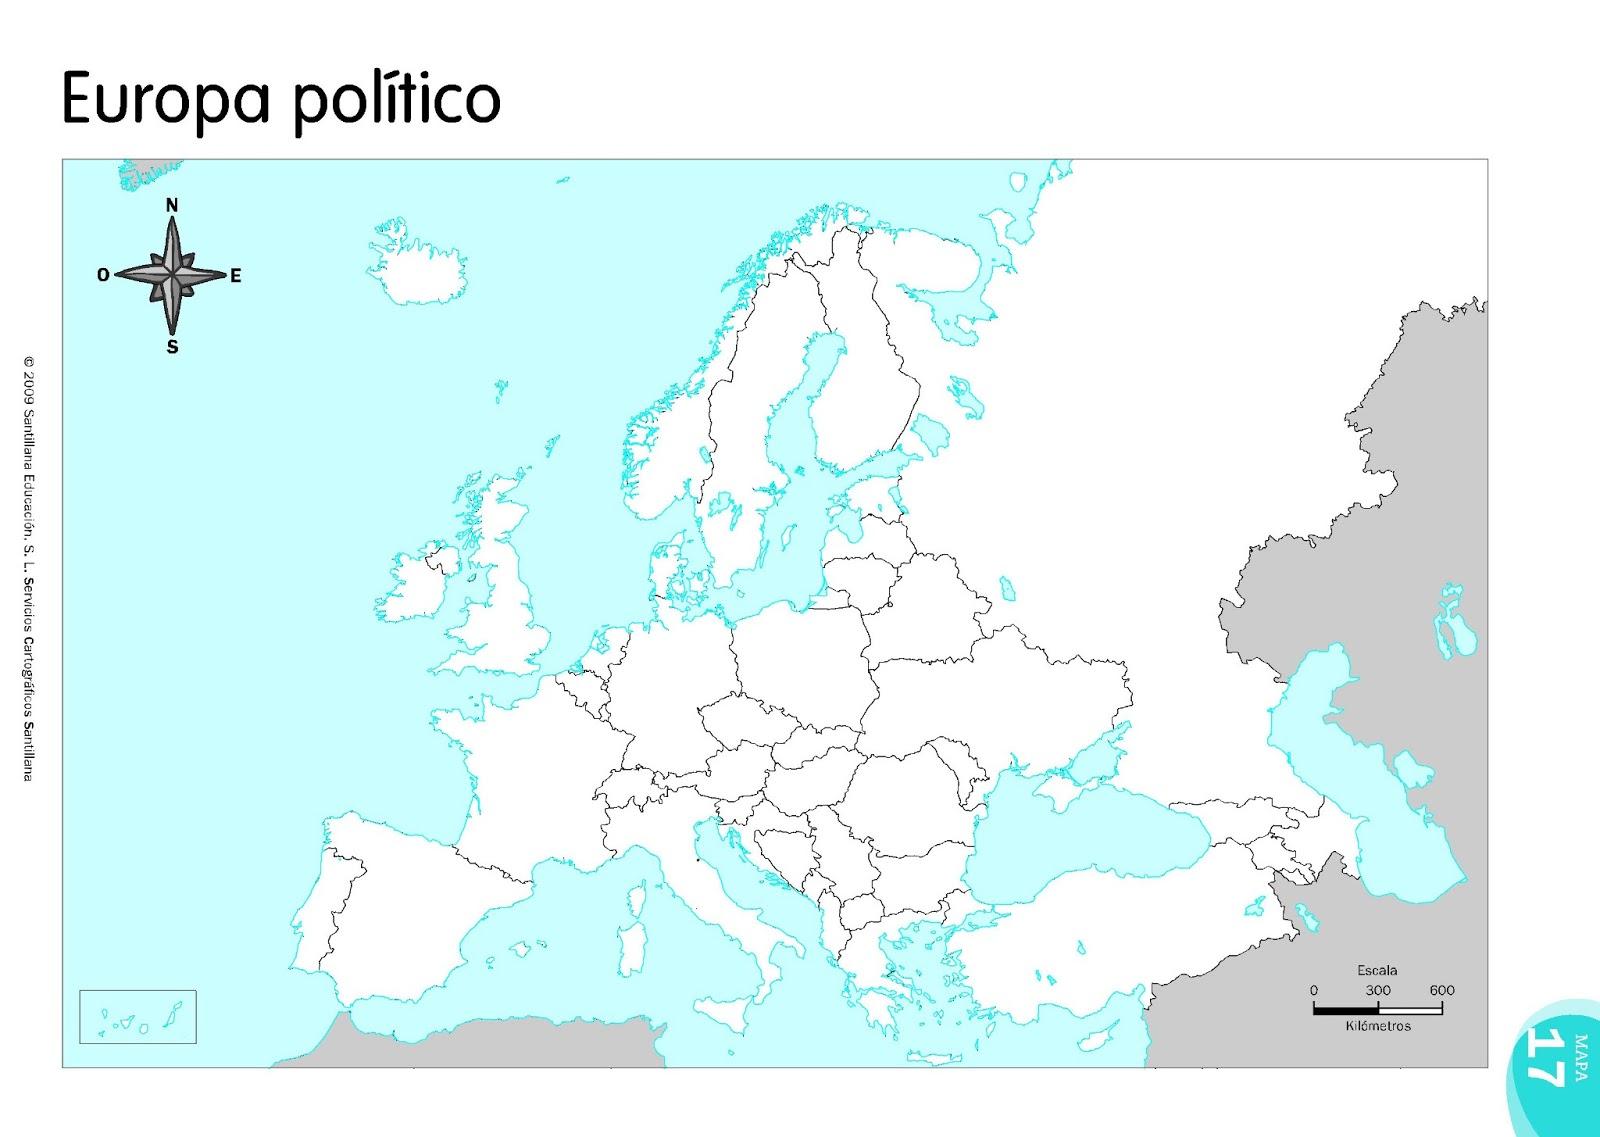 Mapa Politico Europa Mudo Pdf.Mapa De Europa Con Nombres Pdf